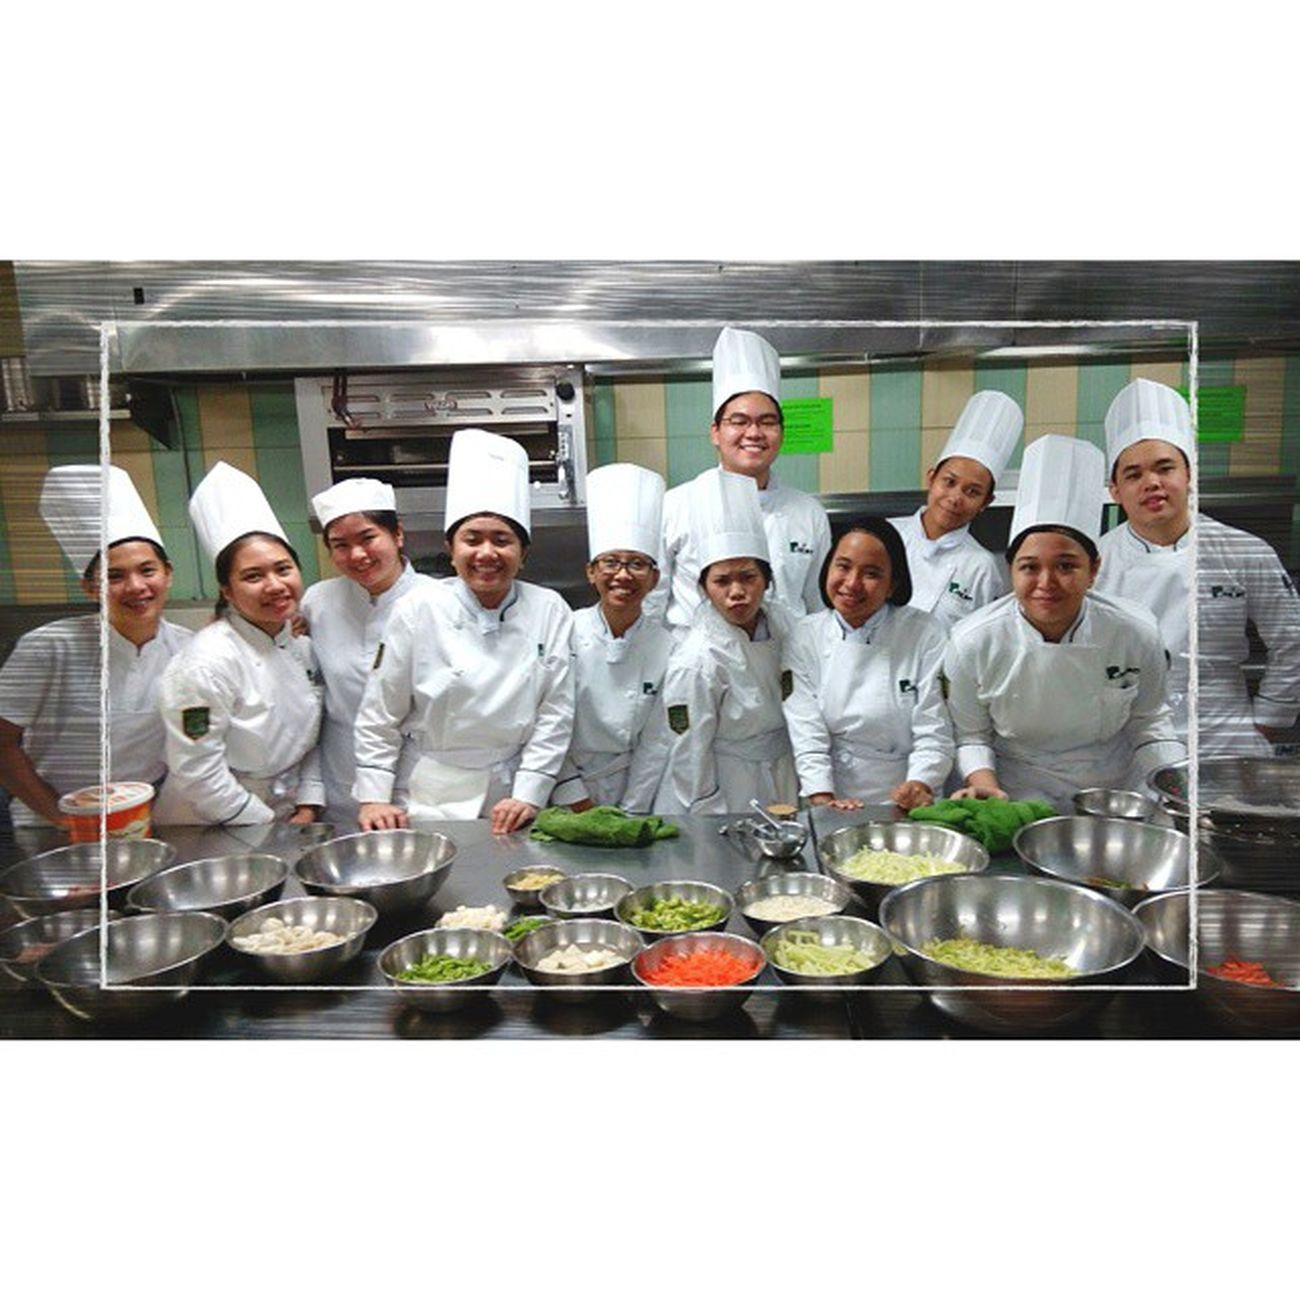 09.16.14 Mise-en-place || The next batch of culinary artists! ⚡ . . . Primlab Gastronomy KitchenBoss Benilde themanansala